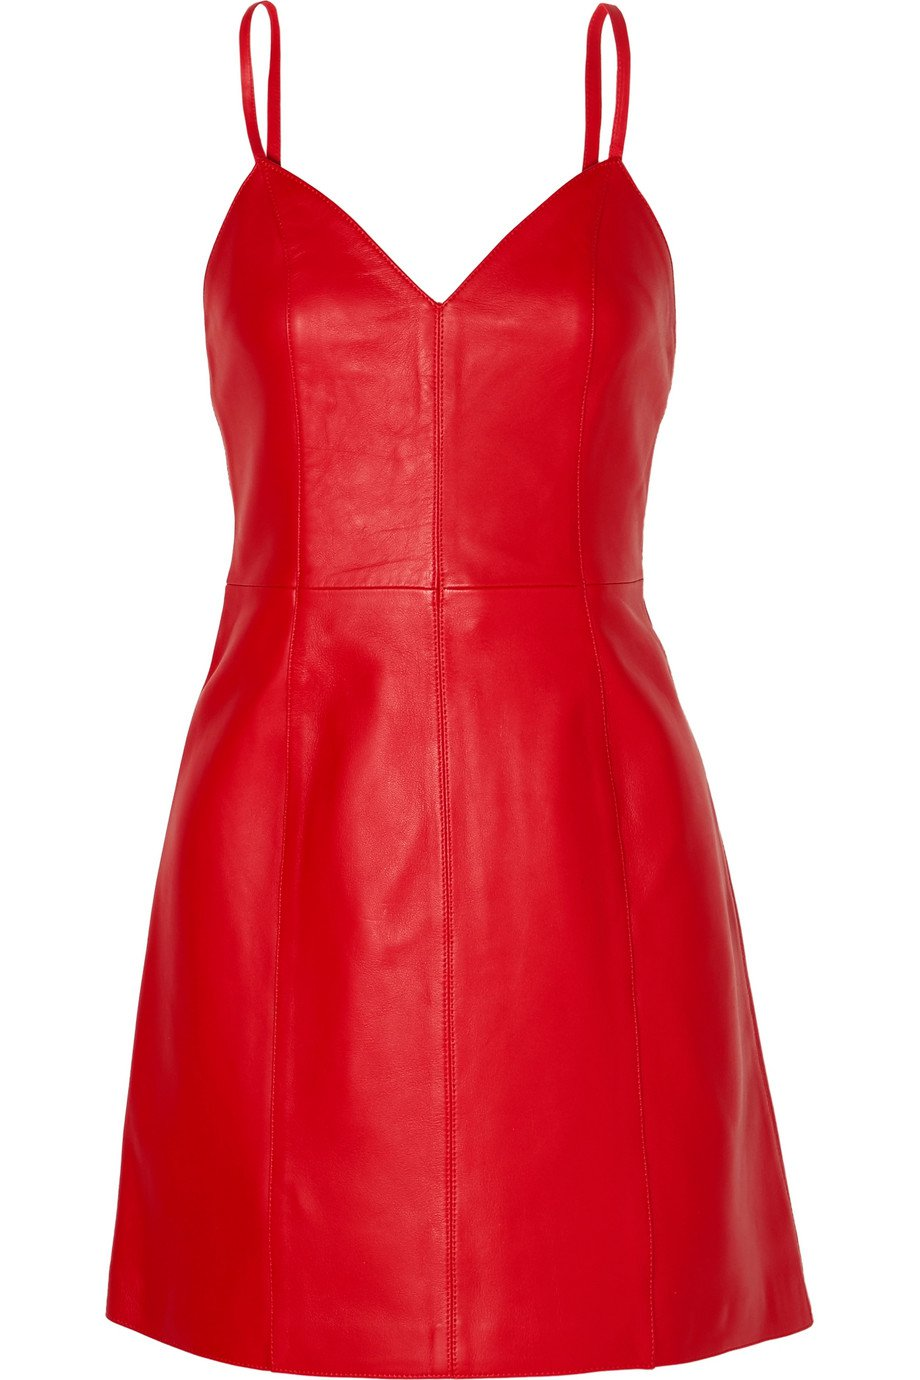 ALEXACHUNG   Leather mini dress   NET-A-PORTER.COM